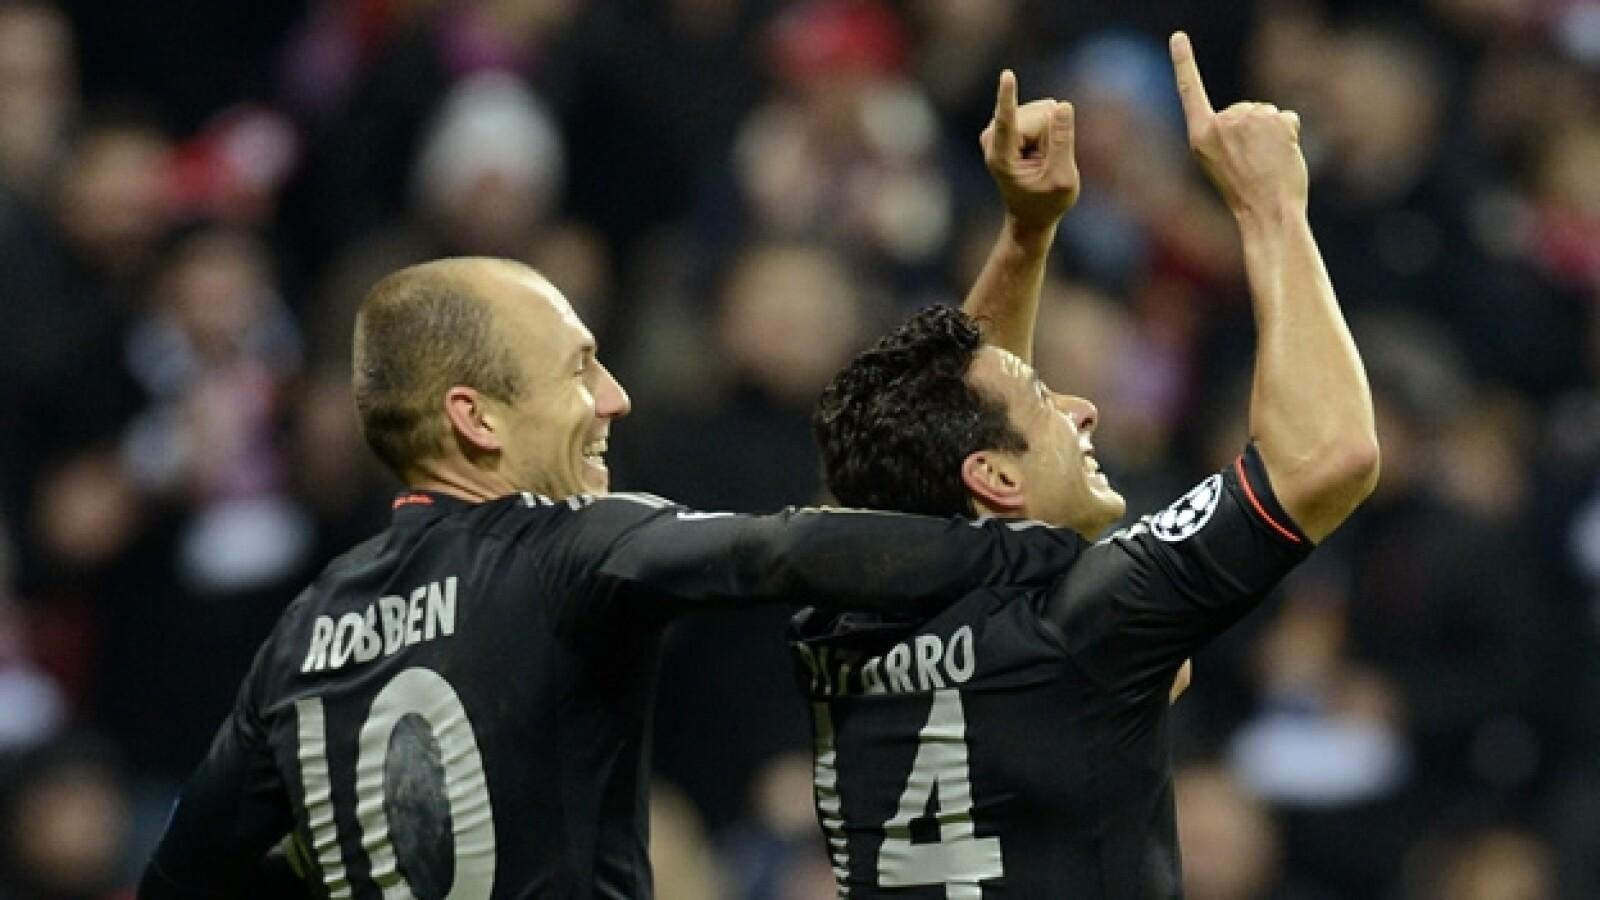 Bayern vs. Losc